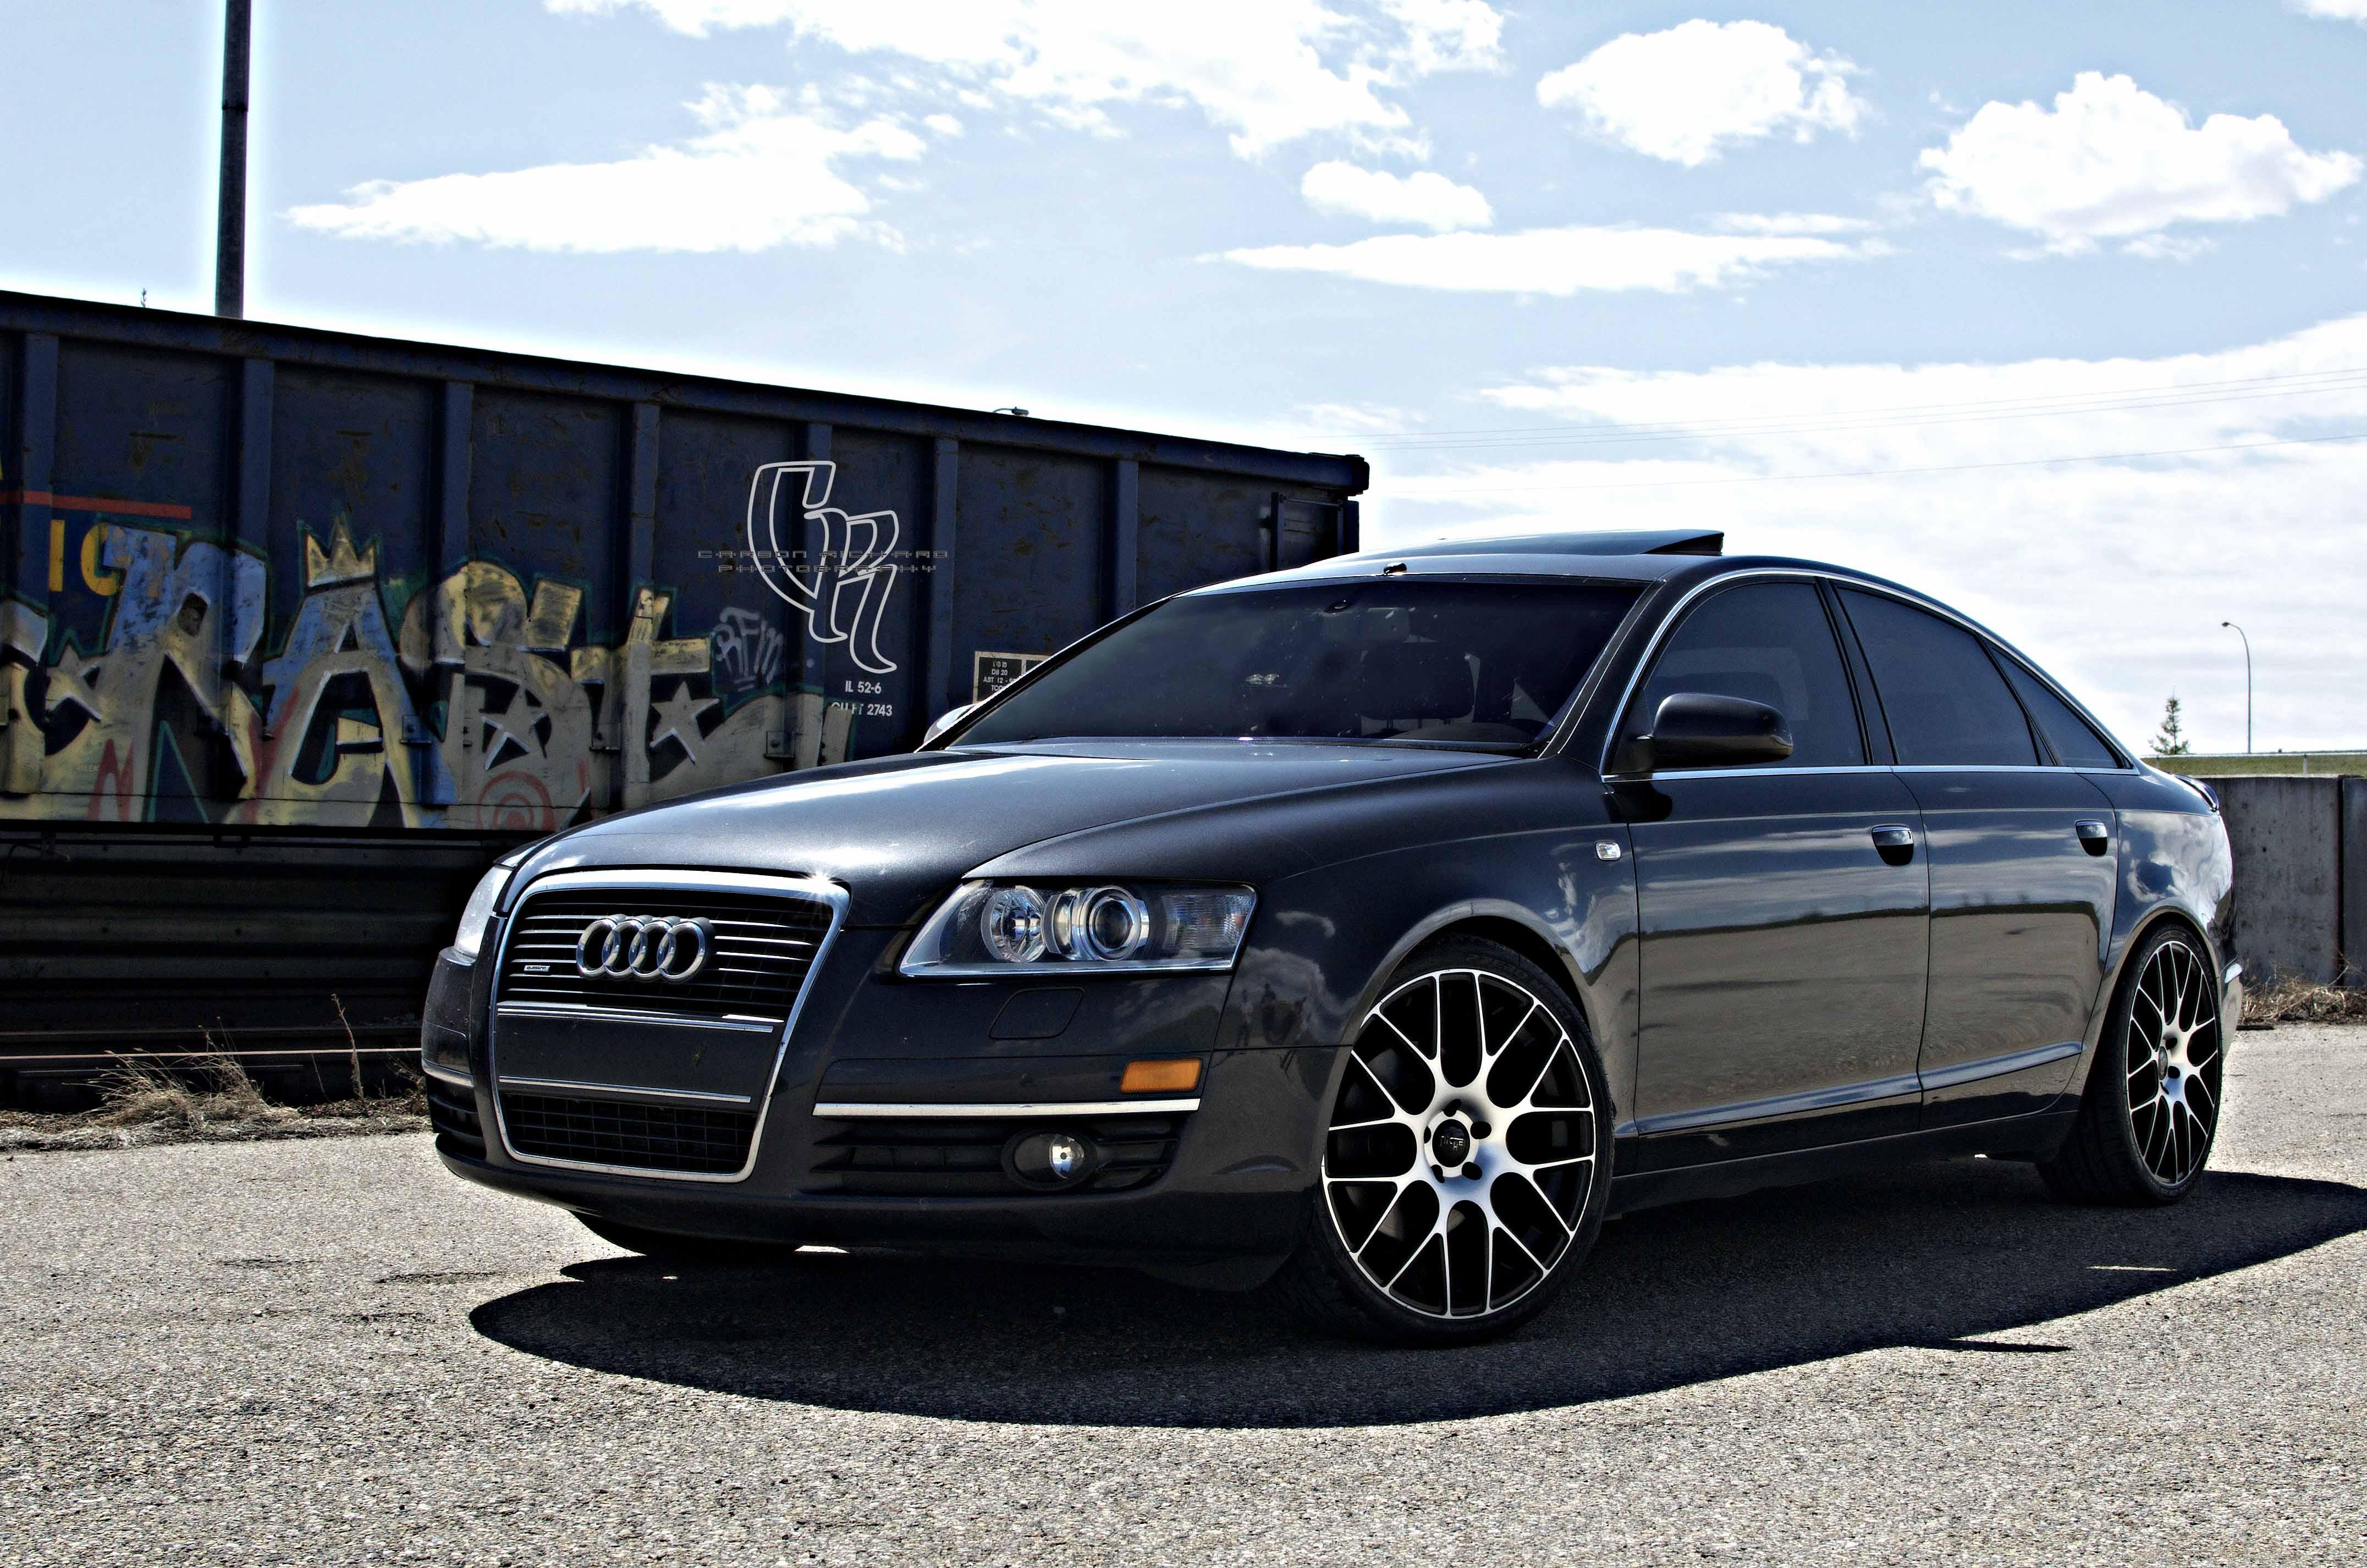 2006 Audi A6 Image 13